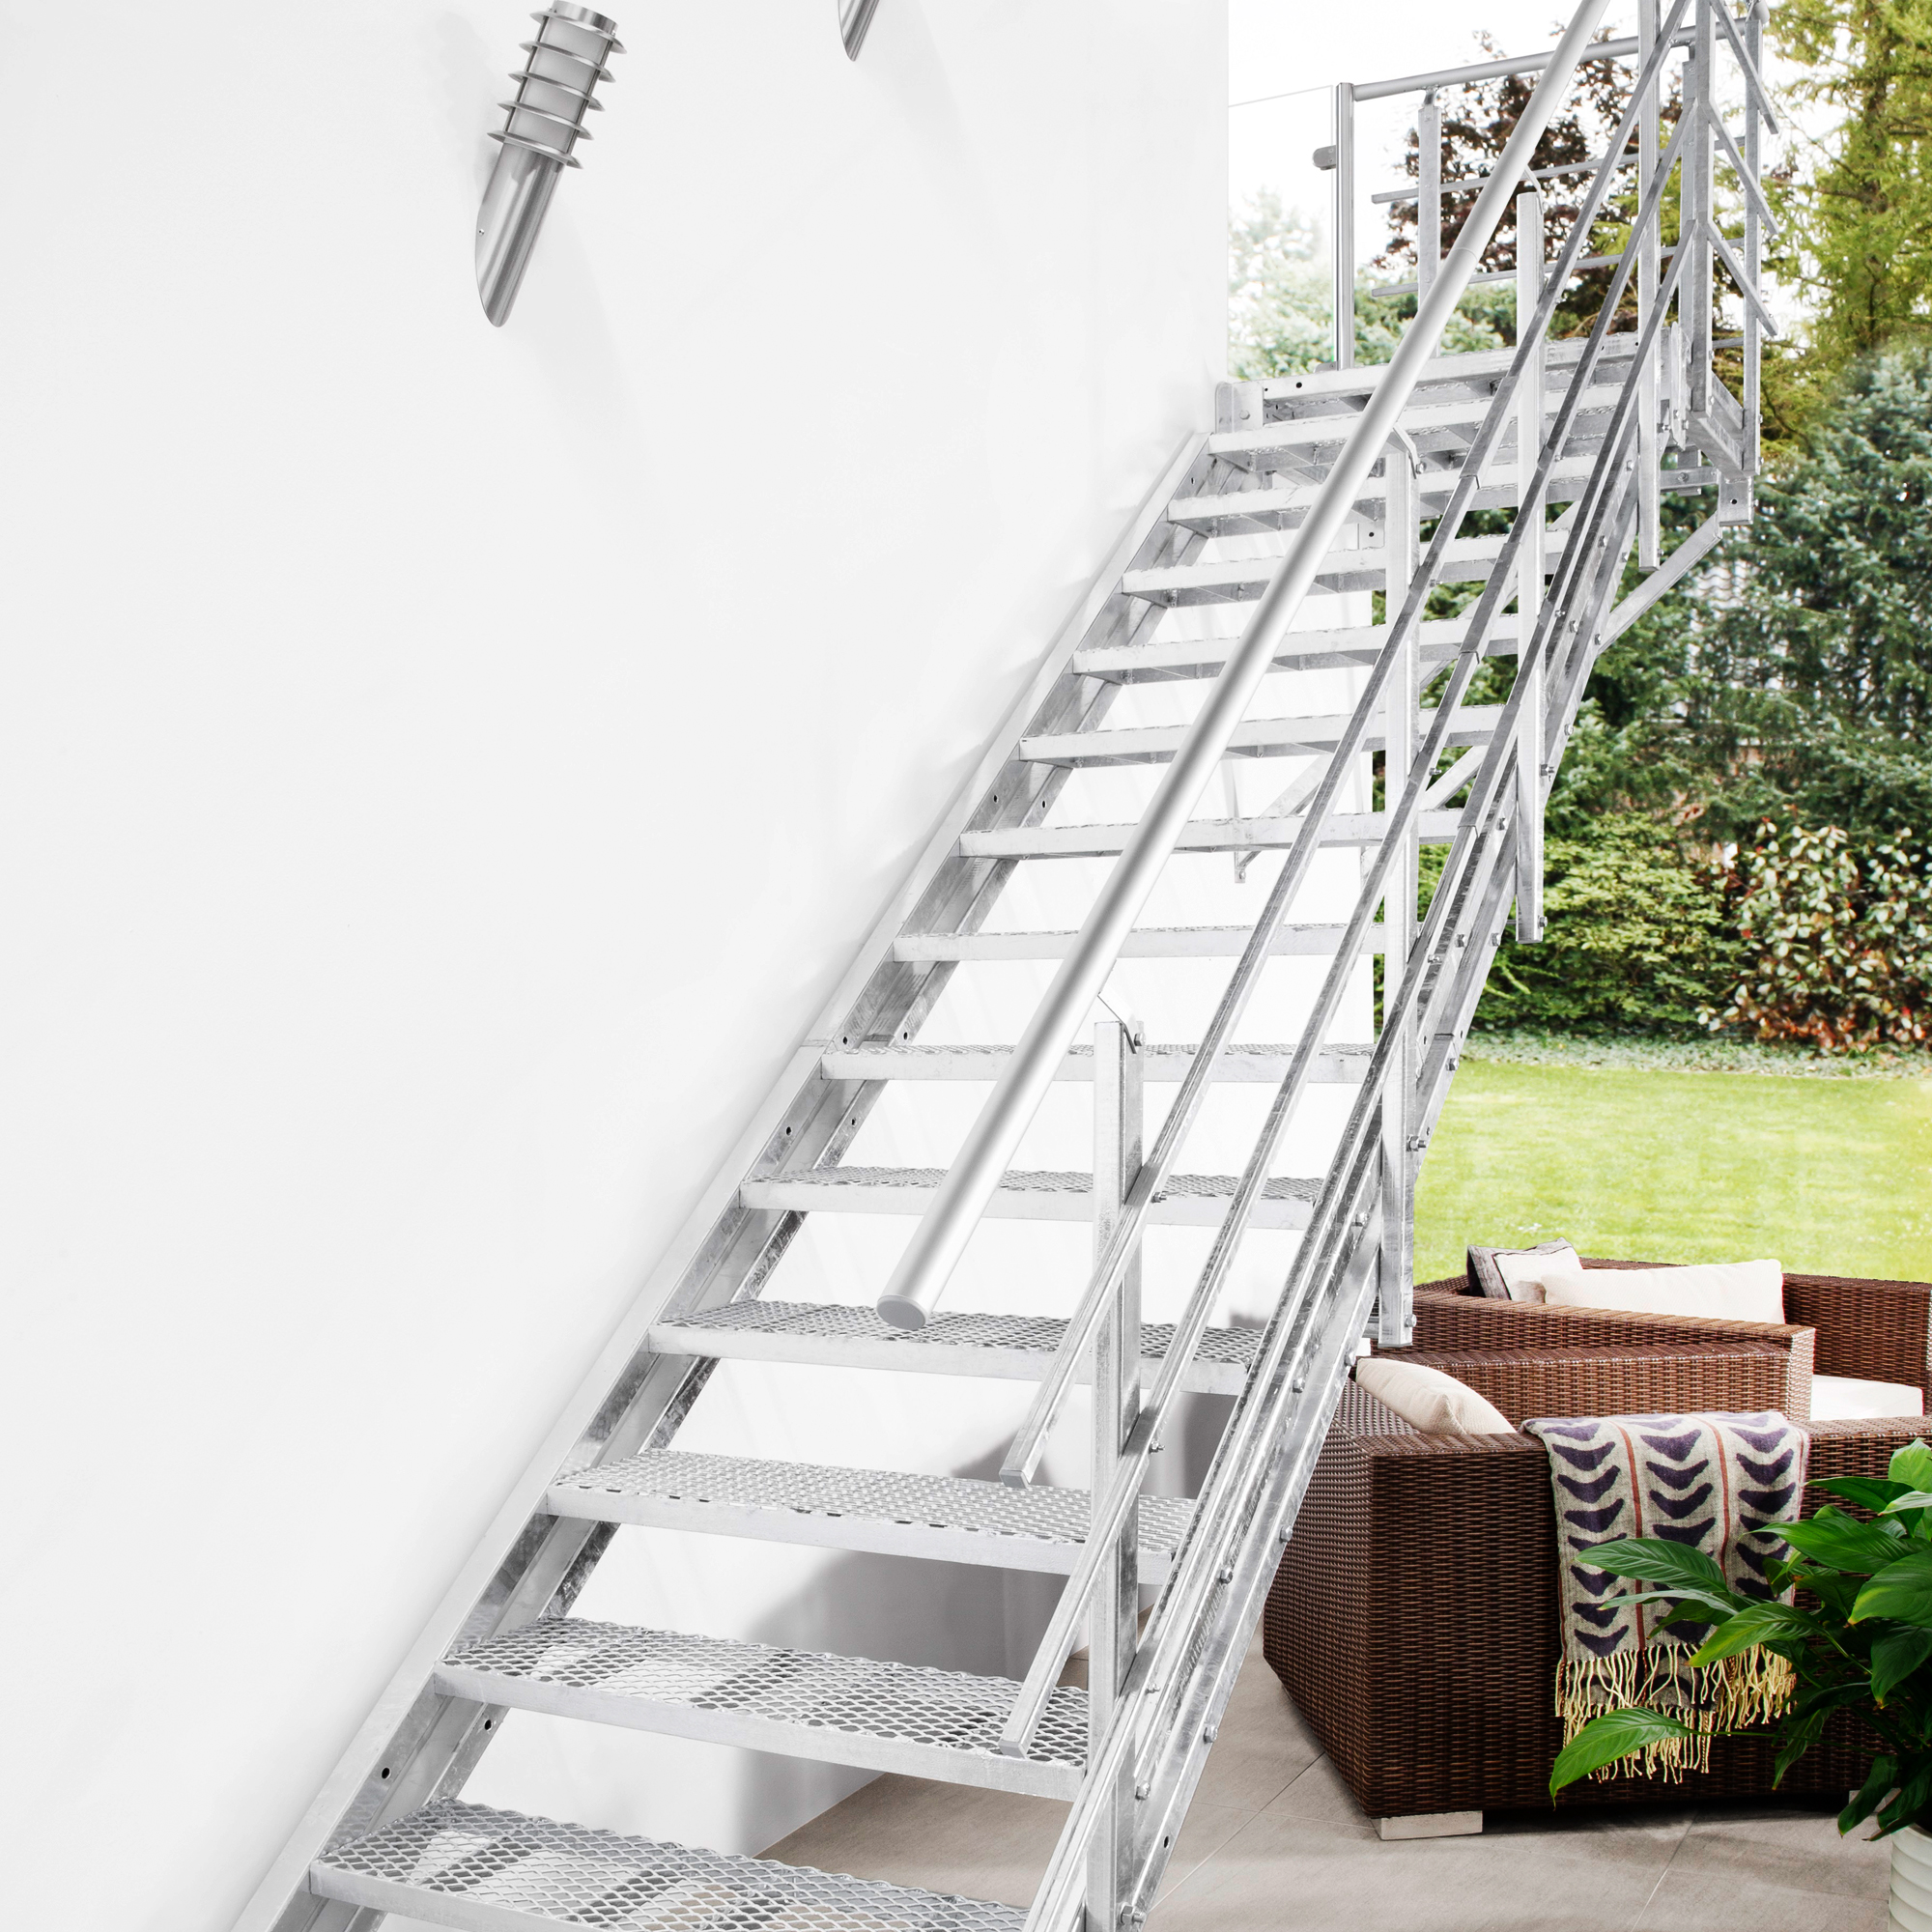 au entreppe verzinkt mit podest hier kaufen treppen intercon. Black Bedroom Furniture Sets. Home Design Ideas